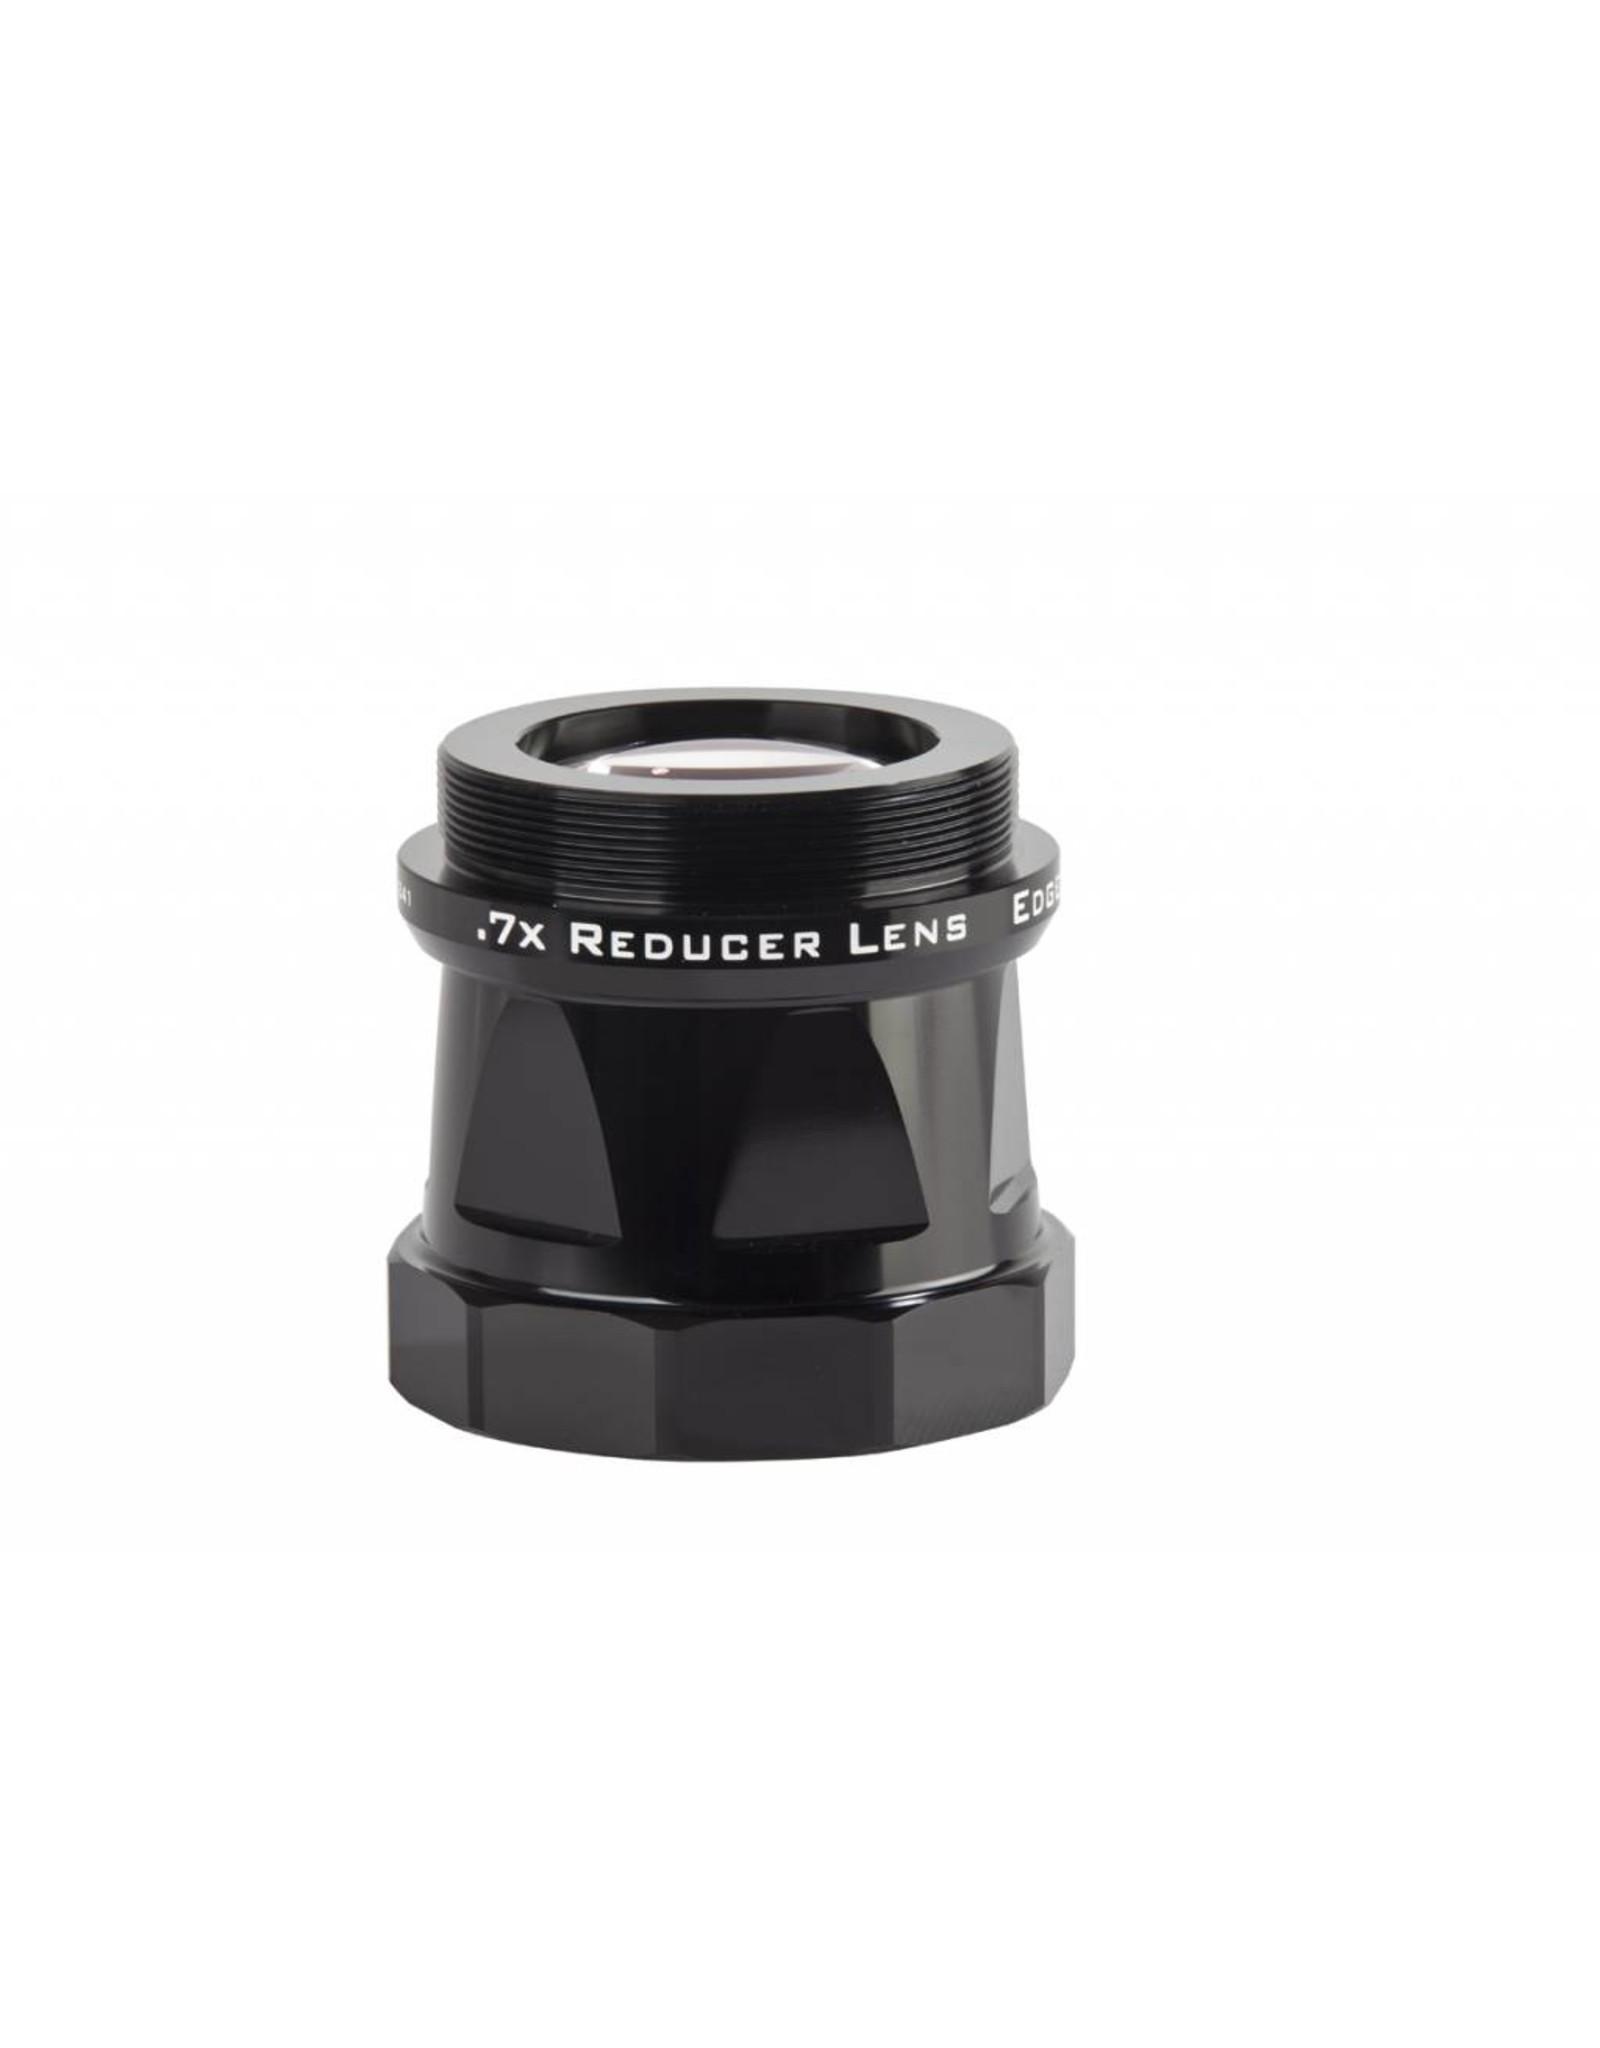 Celestron Celestron Reducer Lens .7x - EdgeHD 1100